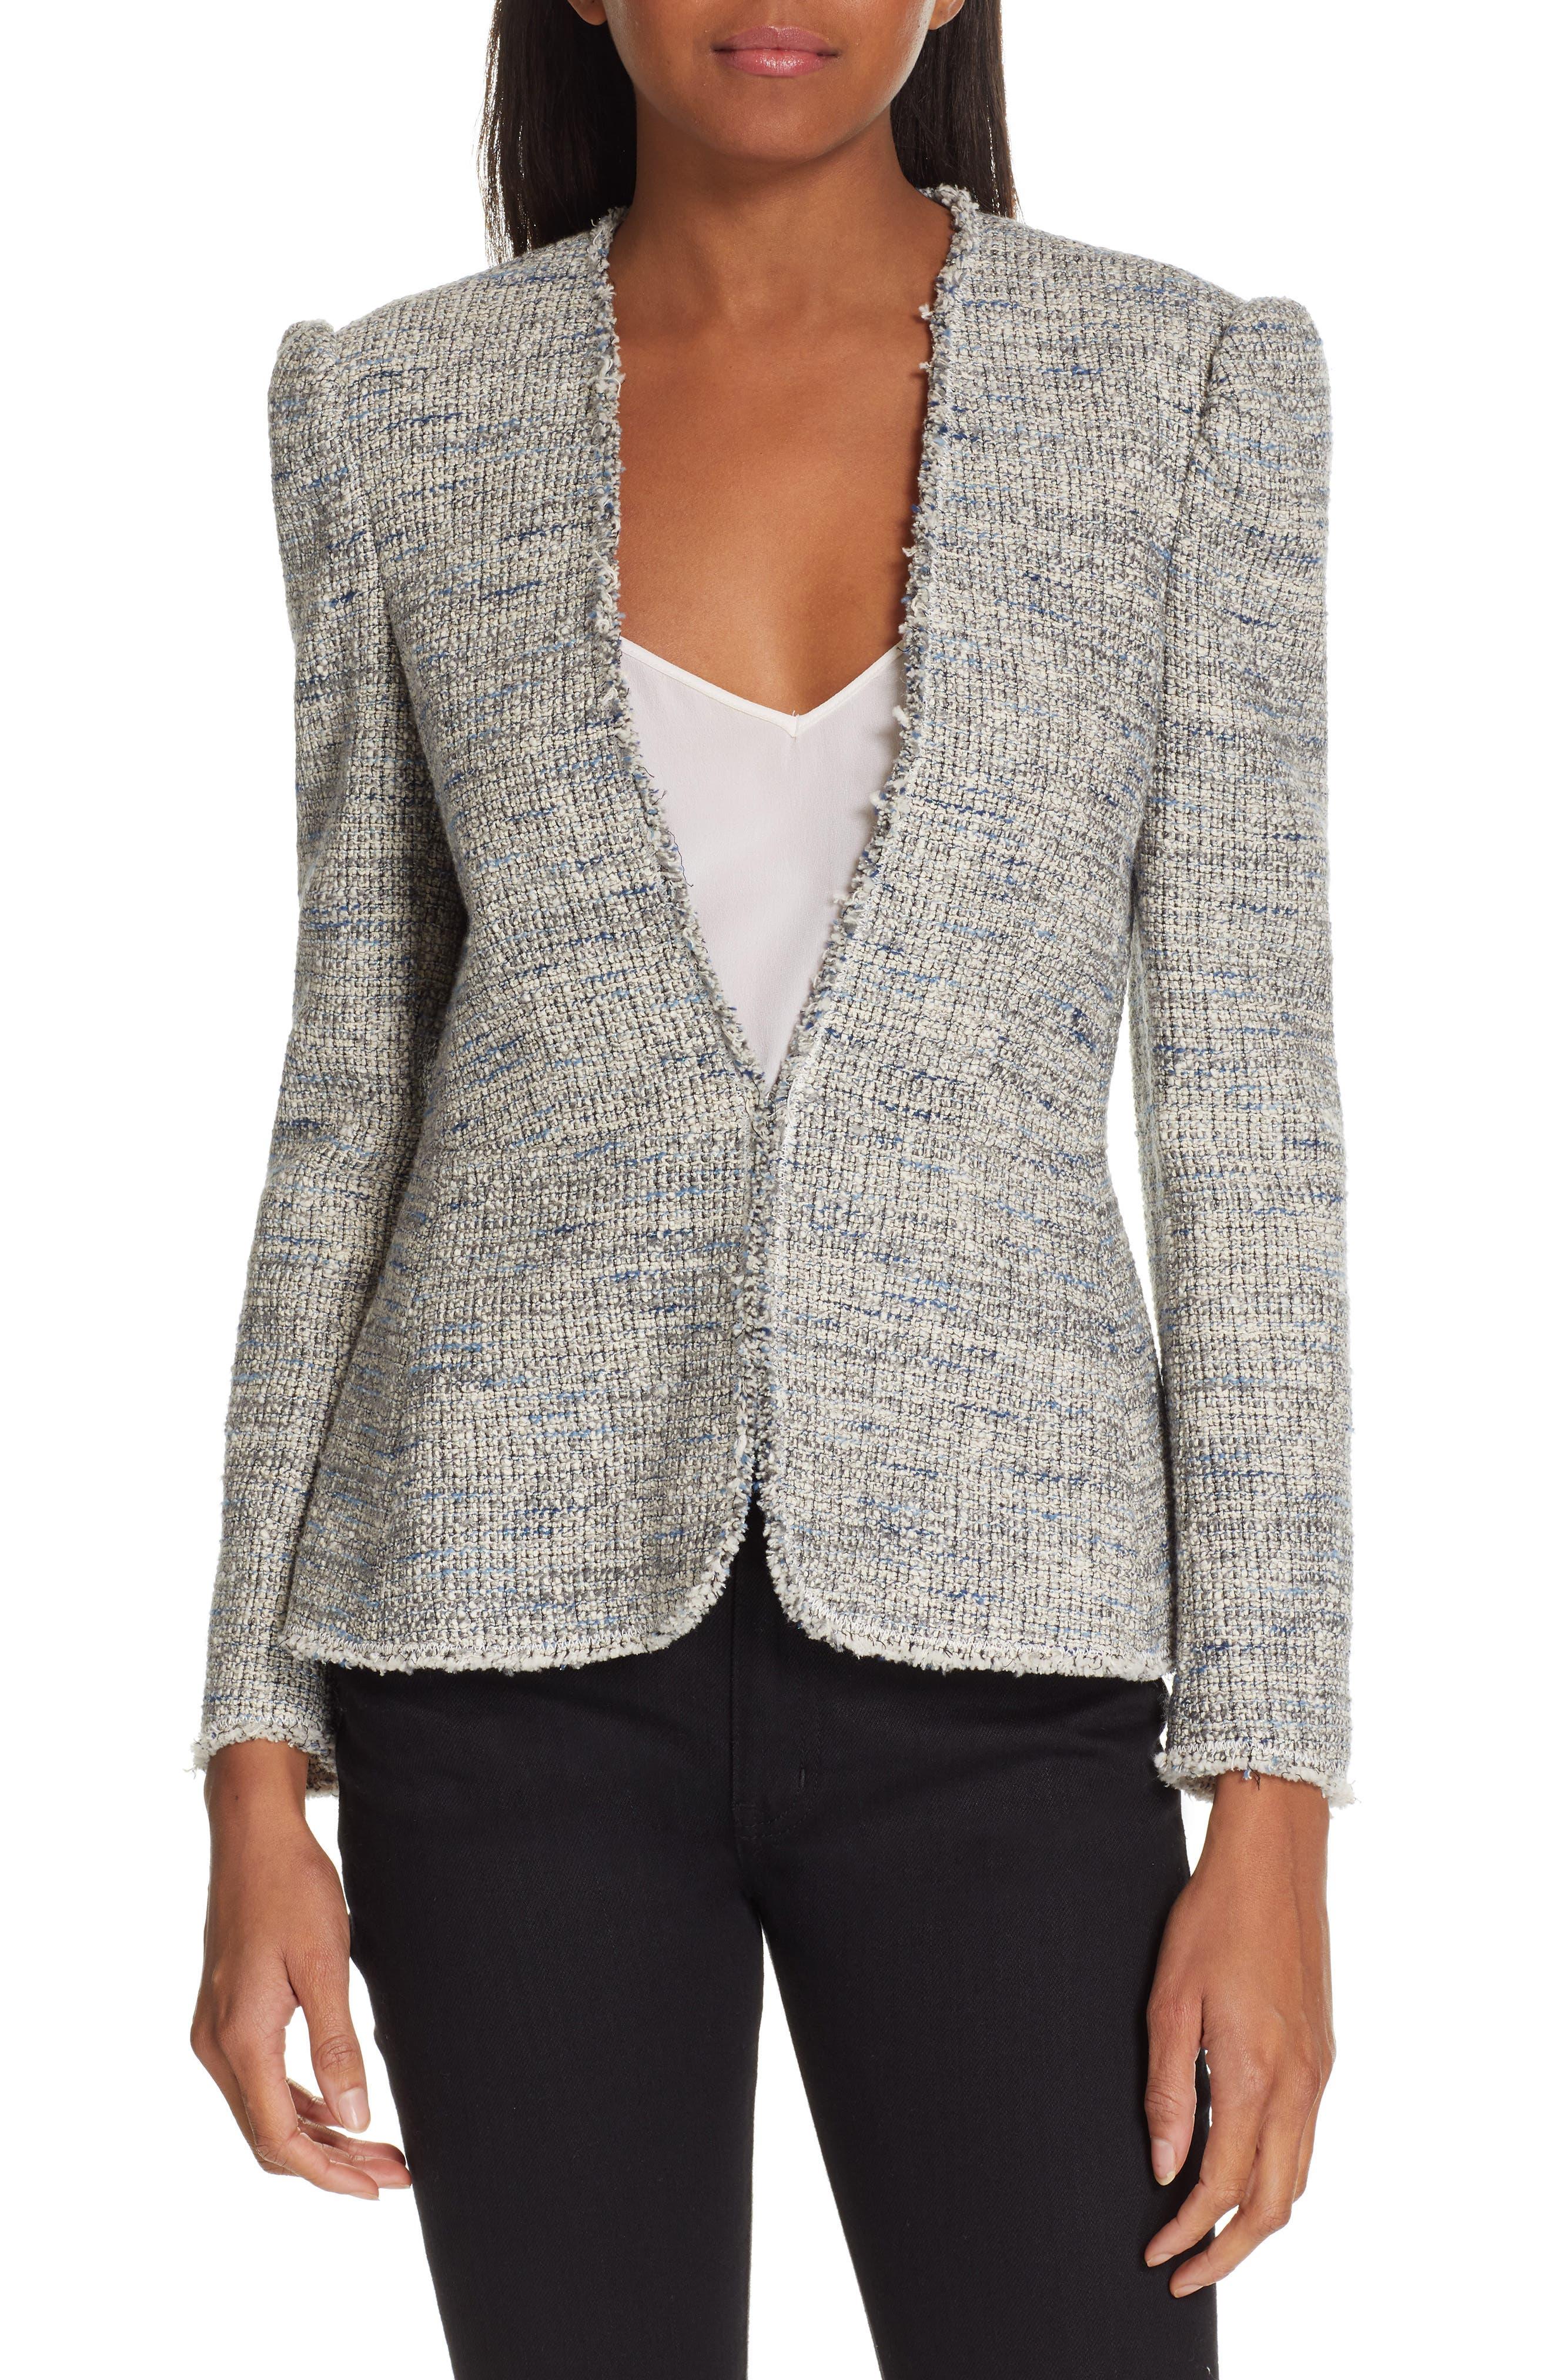 REBECCA TAYLOR, Tweed Peplum Jacket, Main thumbnail 1, color, BLUE/ GREY COMBO